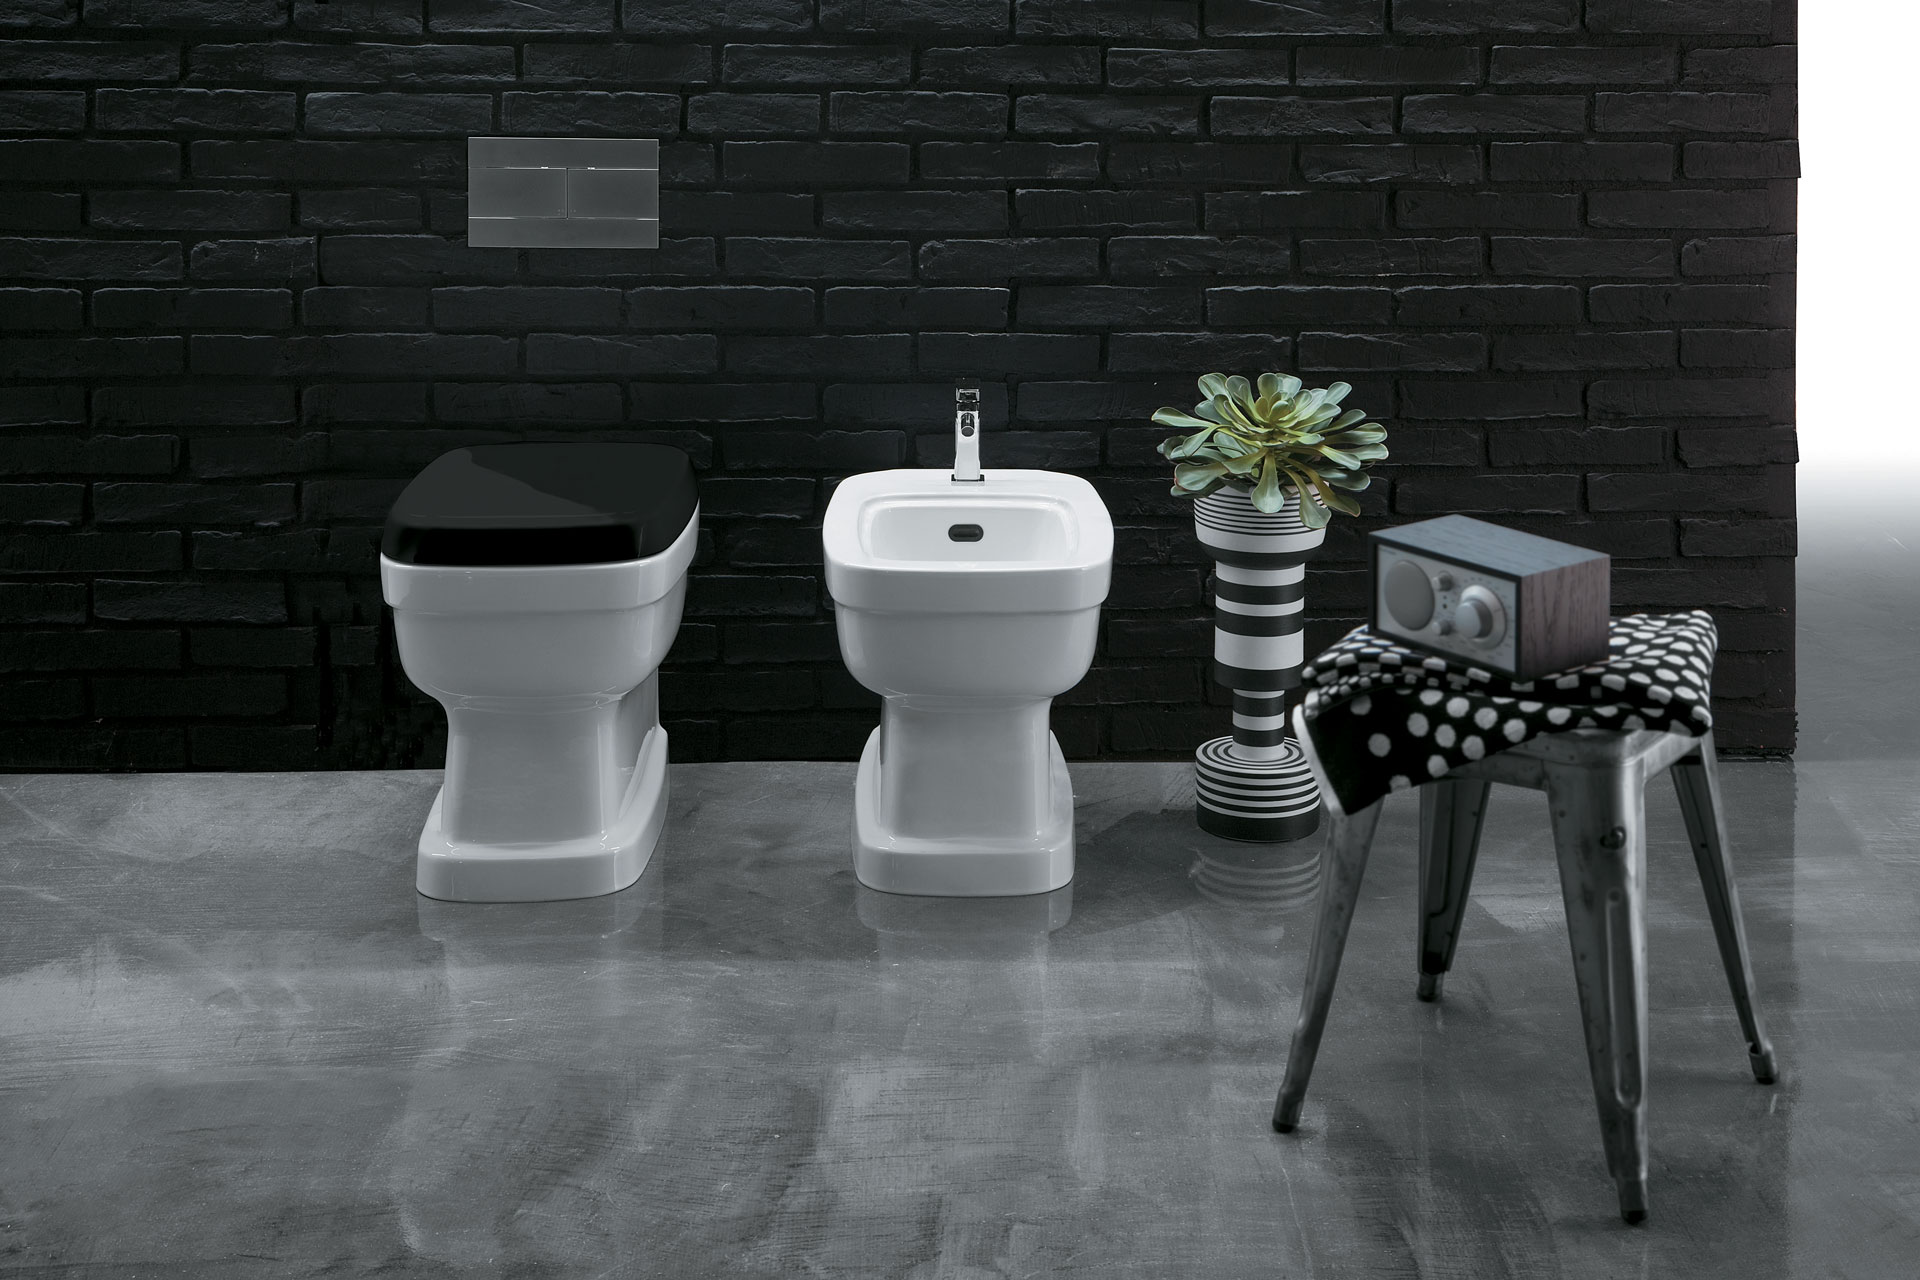 Un richiamo vintage in chiave moderna con simas evolution - Rubinetti sanitari bagno ...